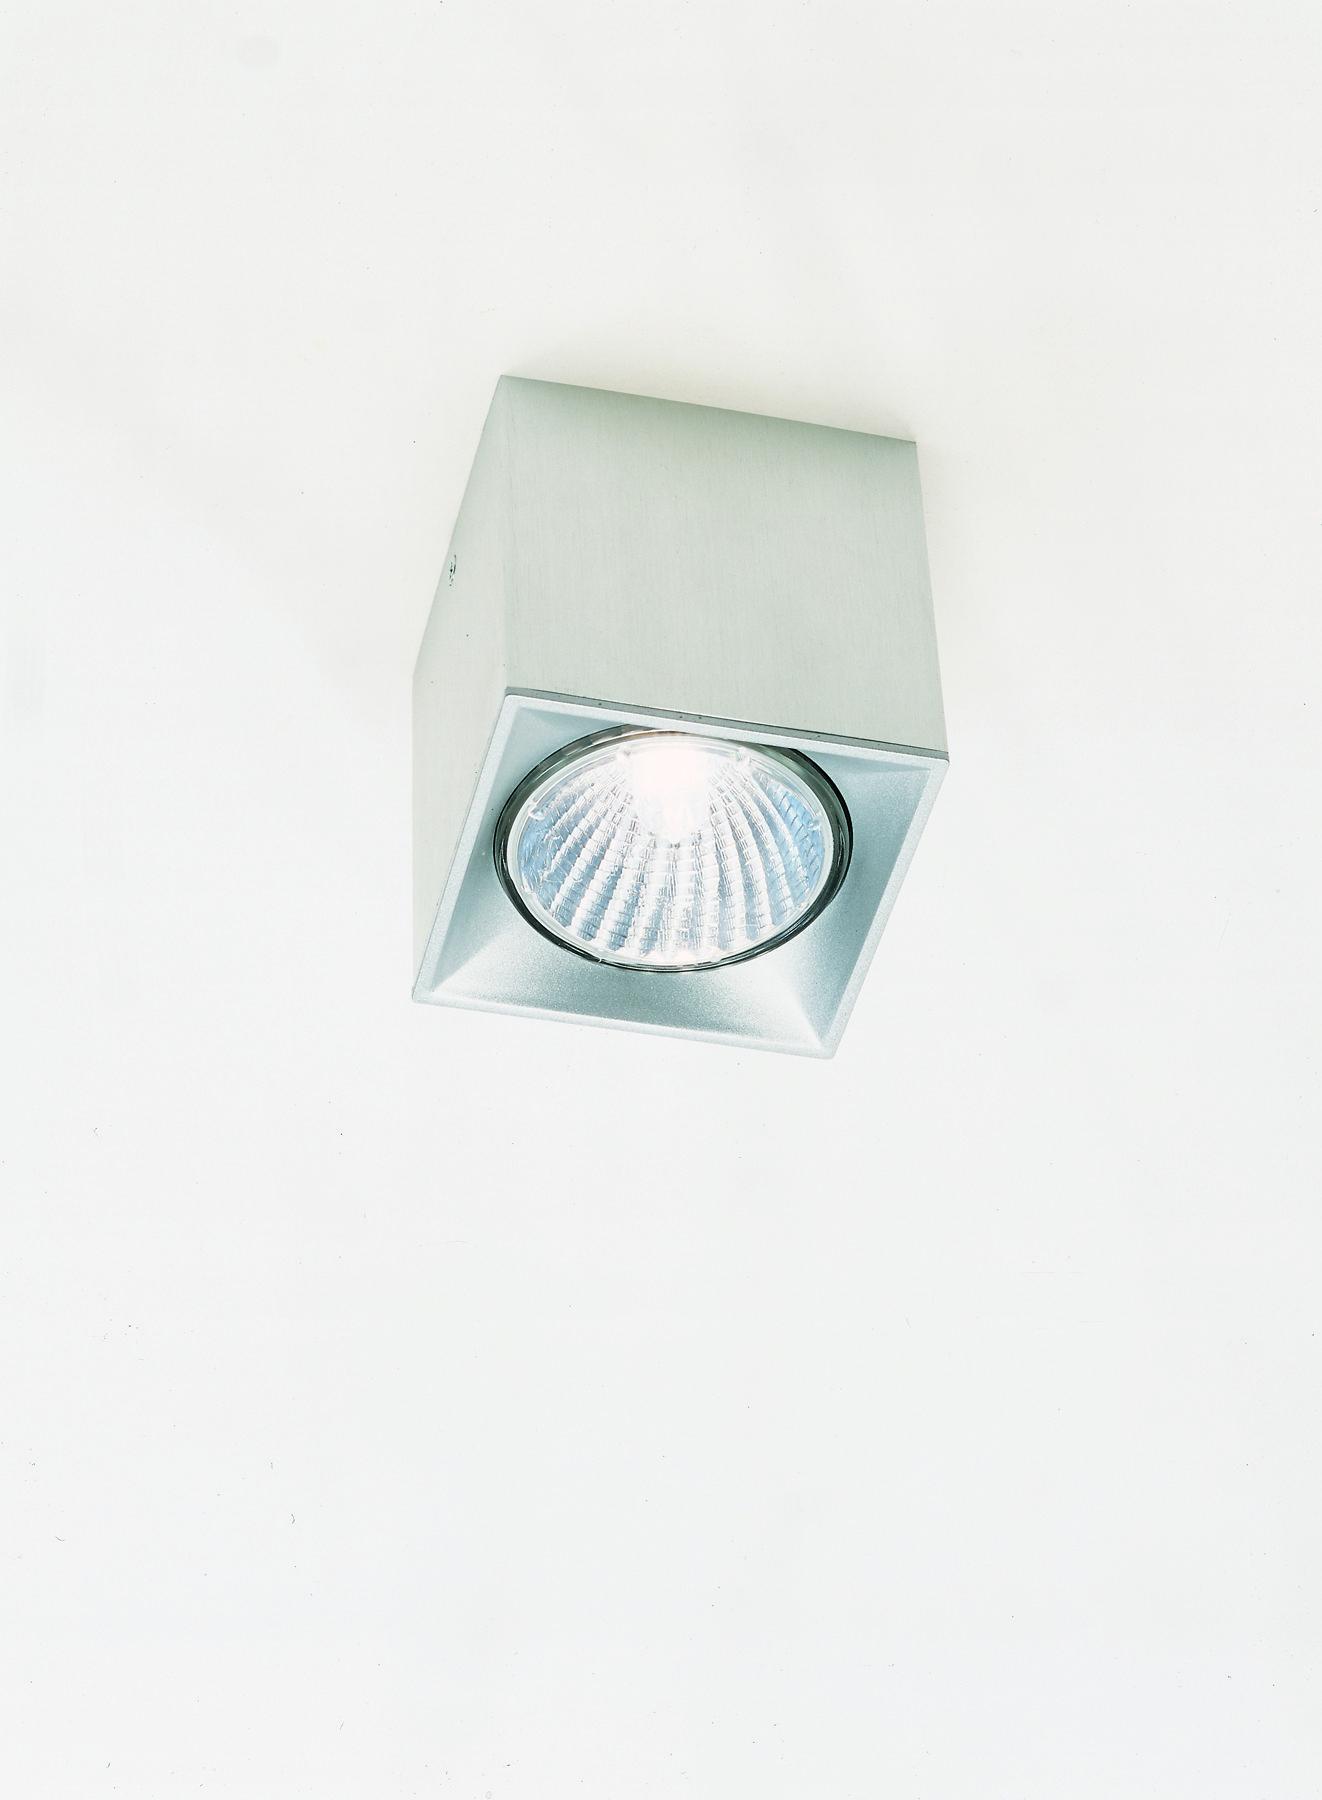 DAU SPOT by Milan Iluminación   MLN Dau Spot/ 3118-6023-6118   Diseñado por Flemming Bjorn / Designed by Flemming Bjorn